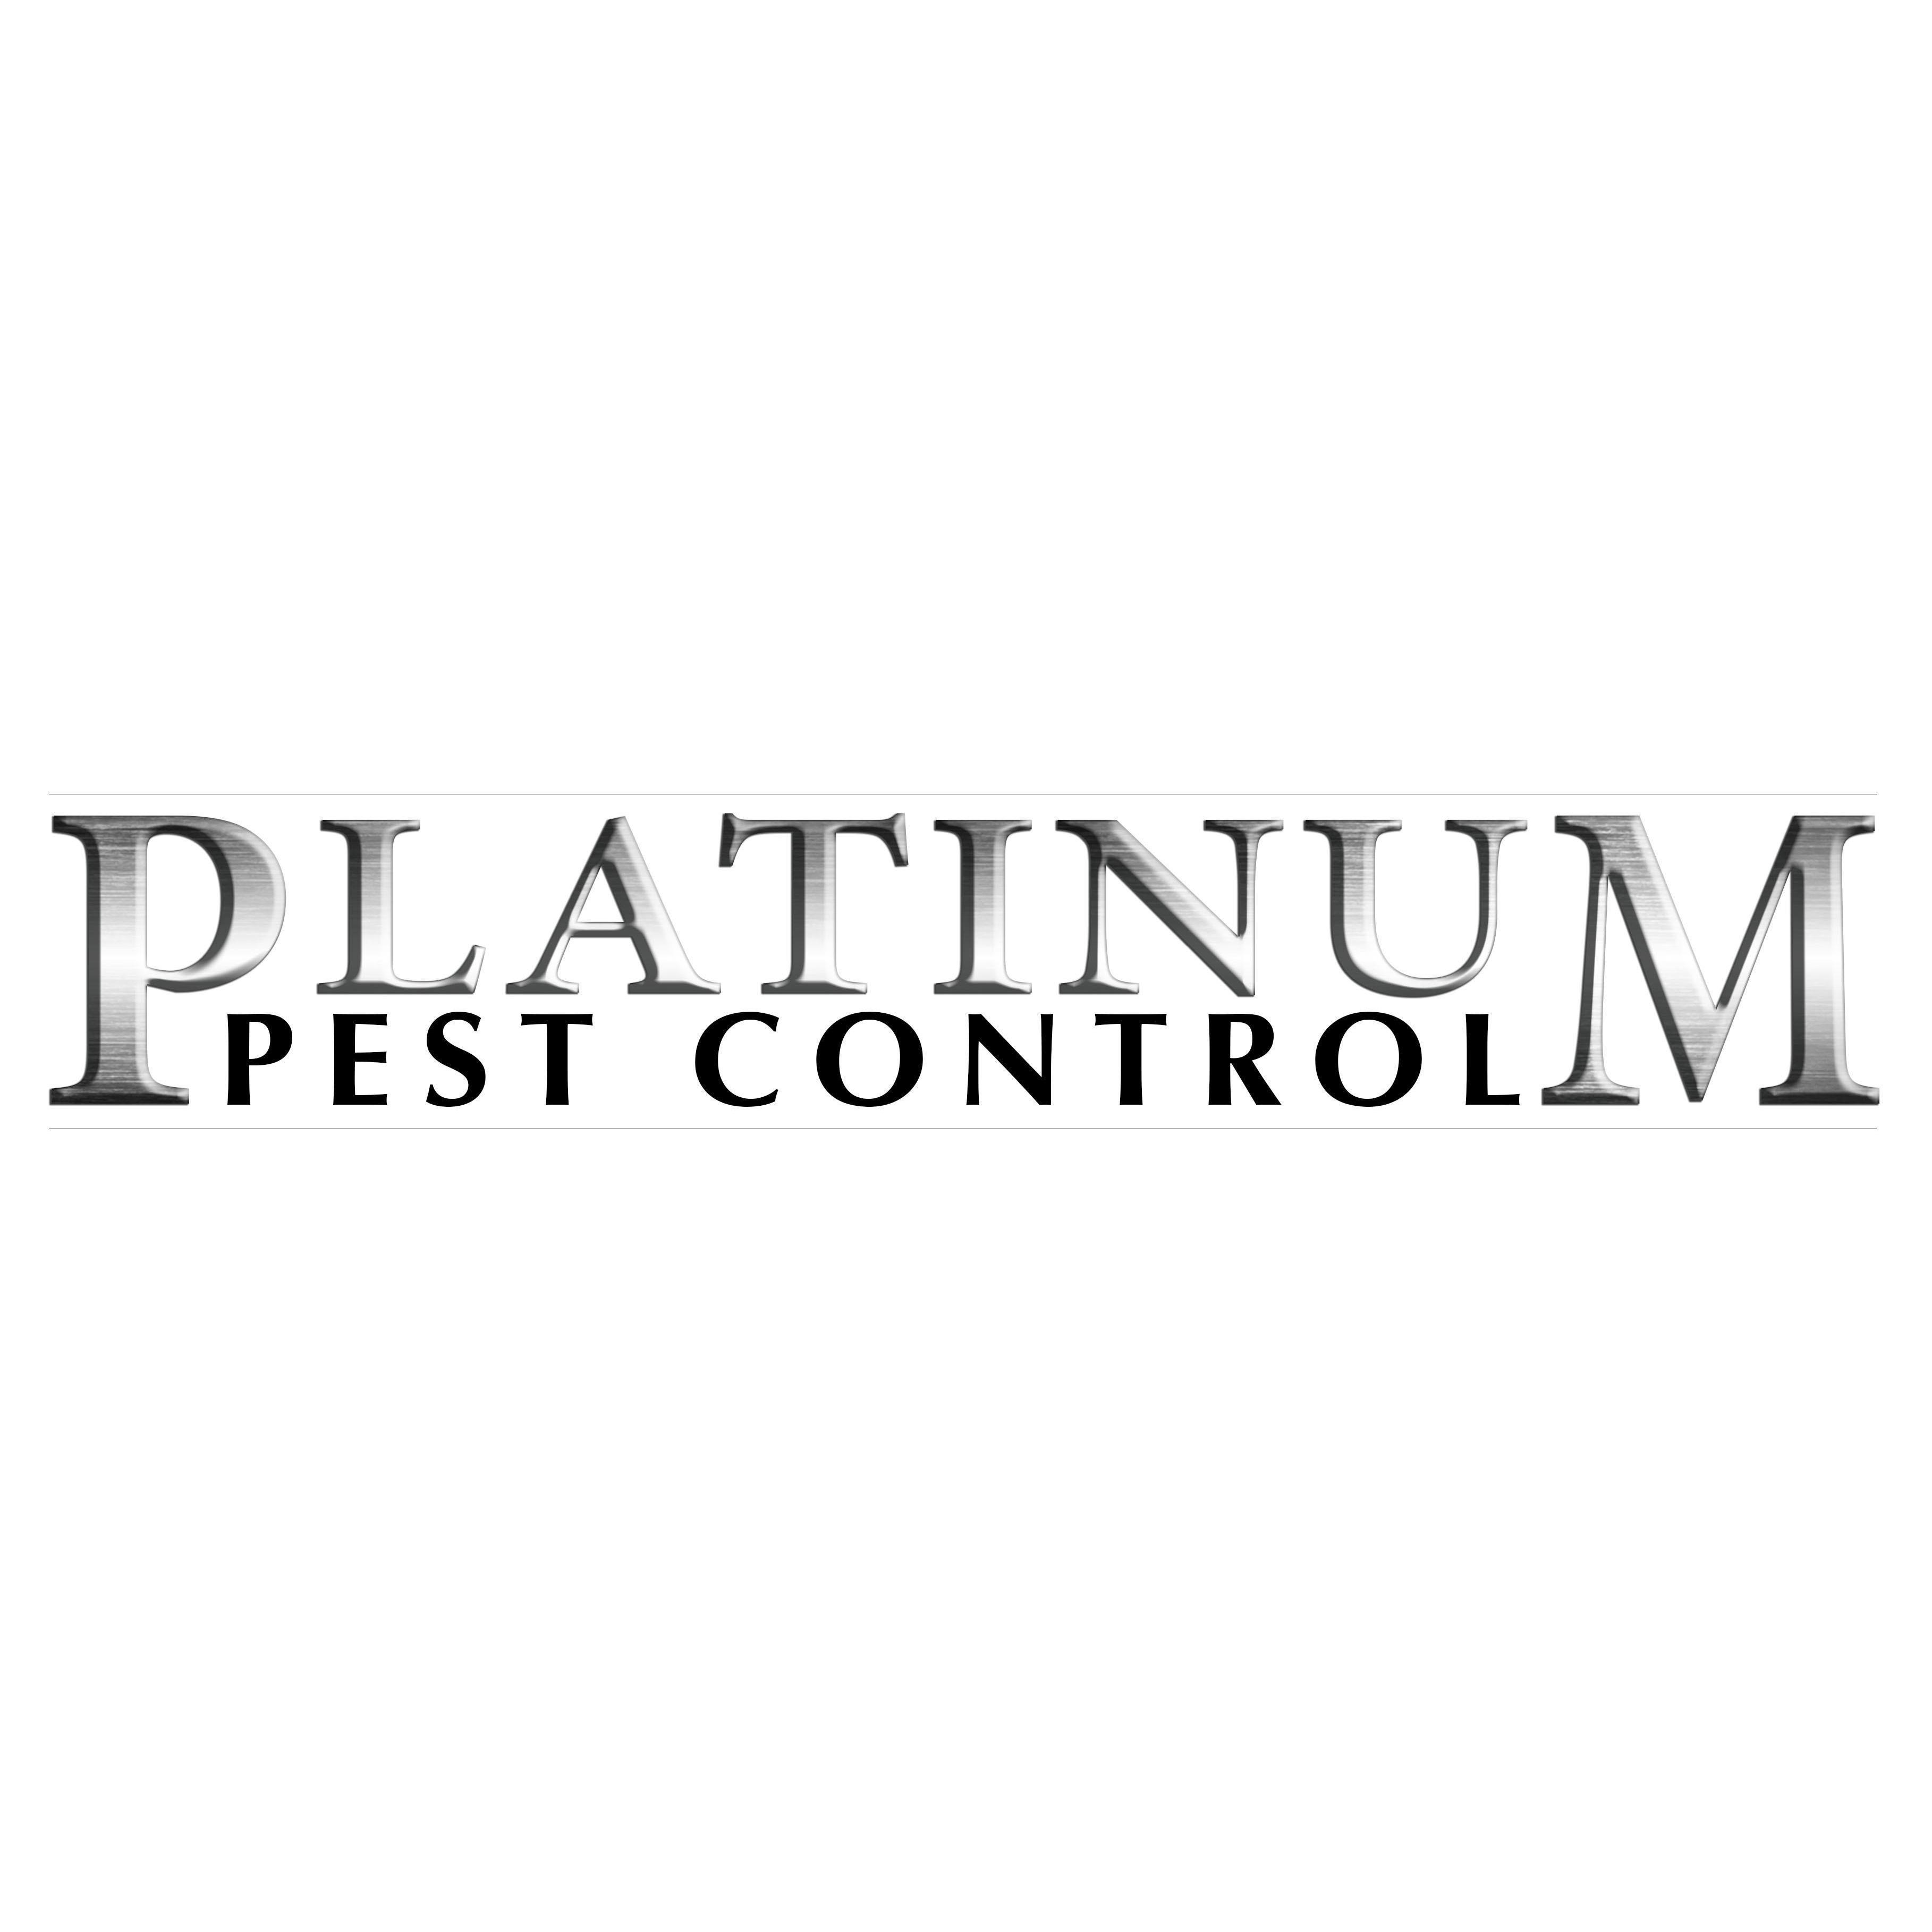 Pest Control Service in NY Brewerton 13029 Platinum Pest Control, INC 9426 Peregrin Ln  (315)676-5490